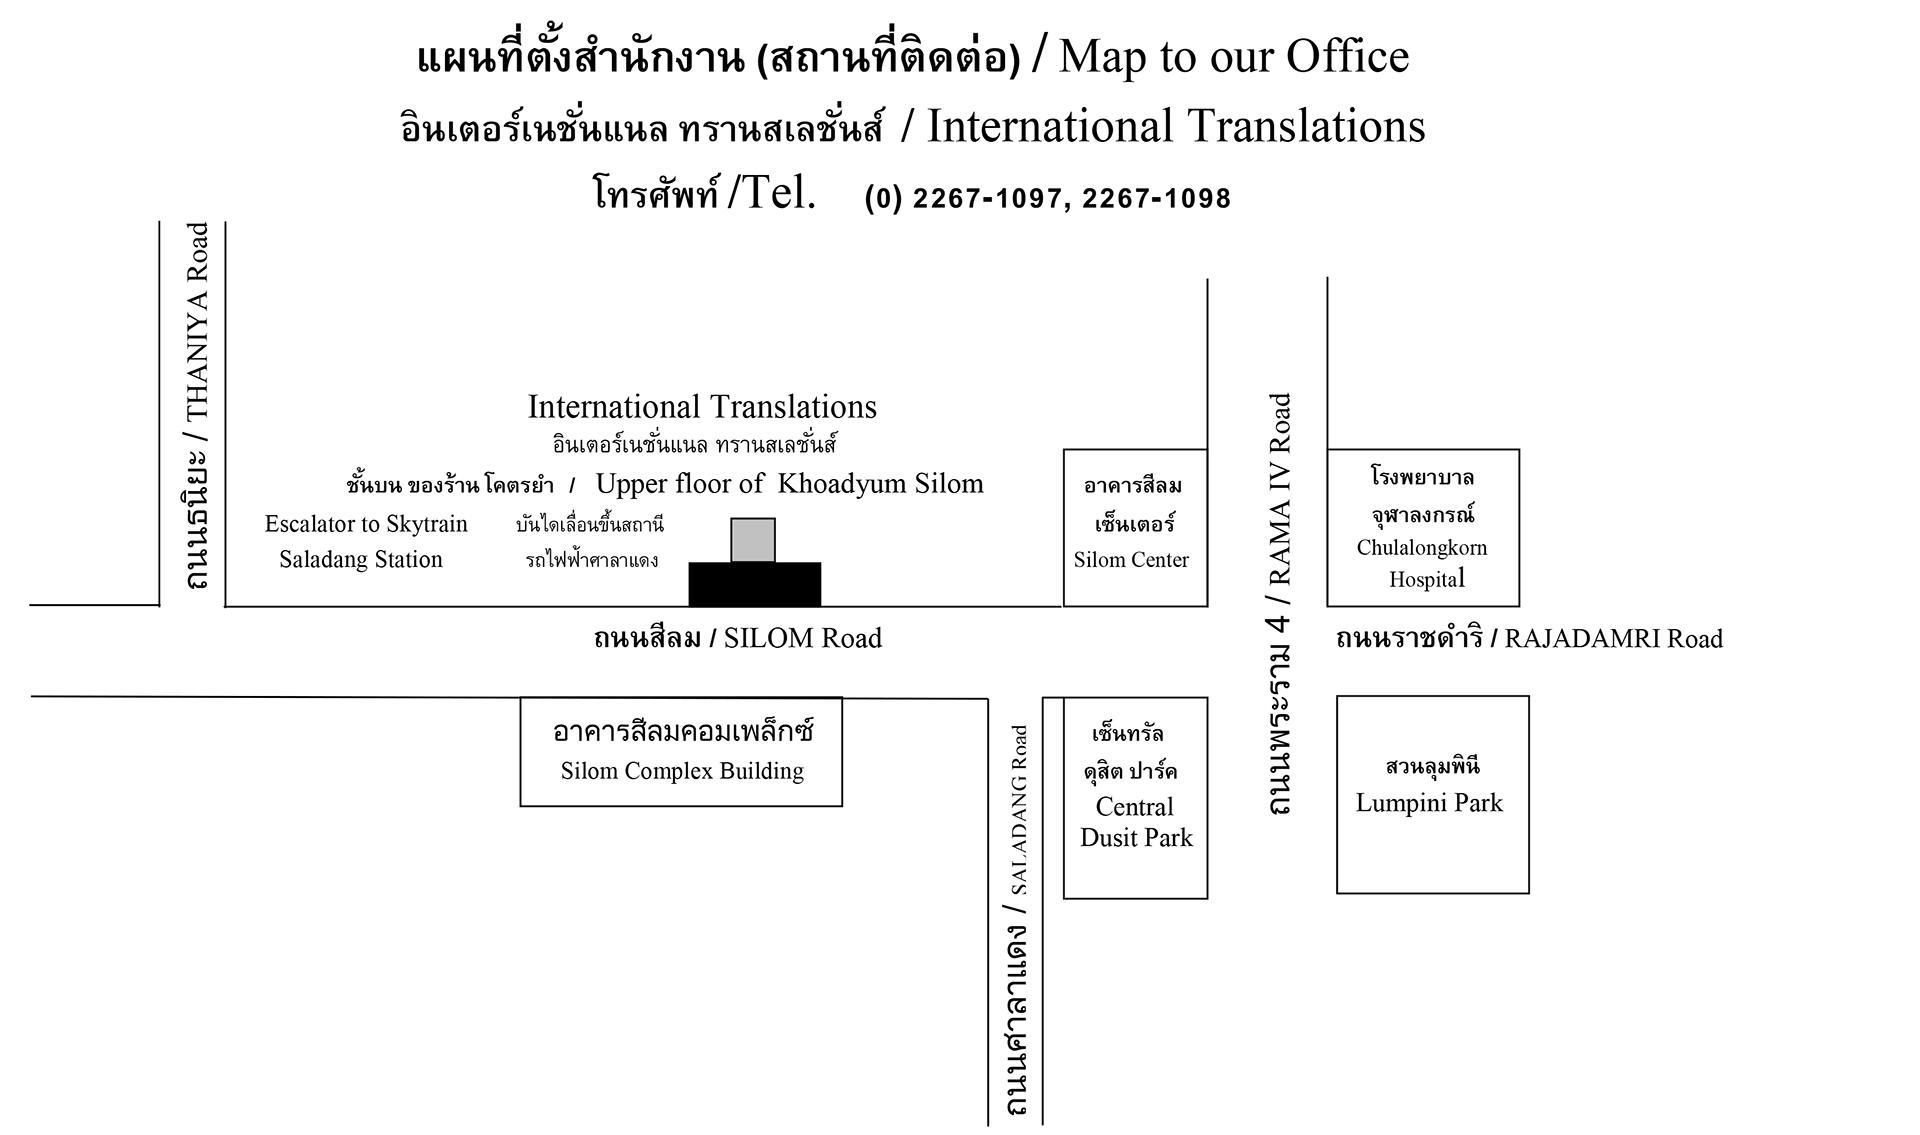 International Translations Office Map, Silom